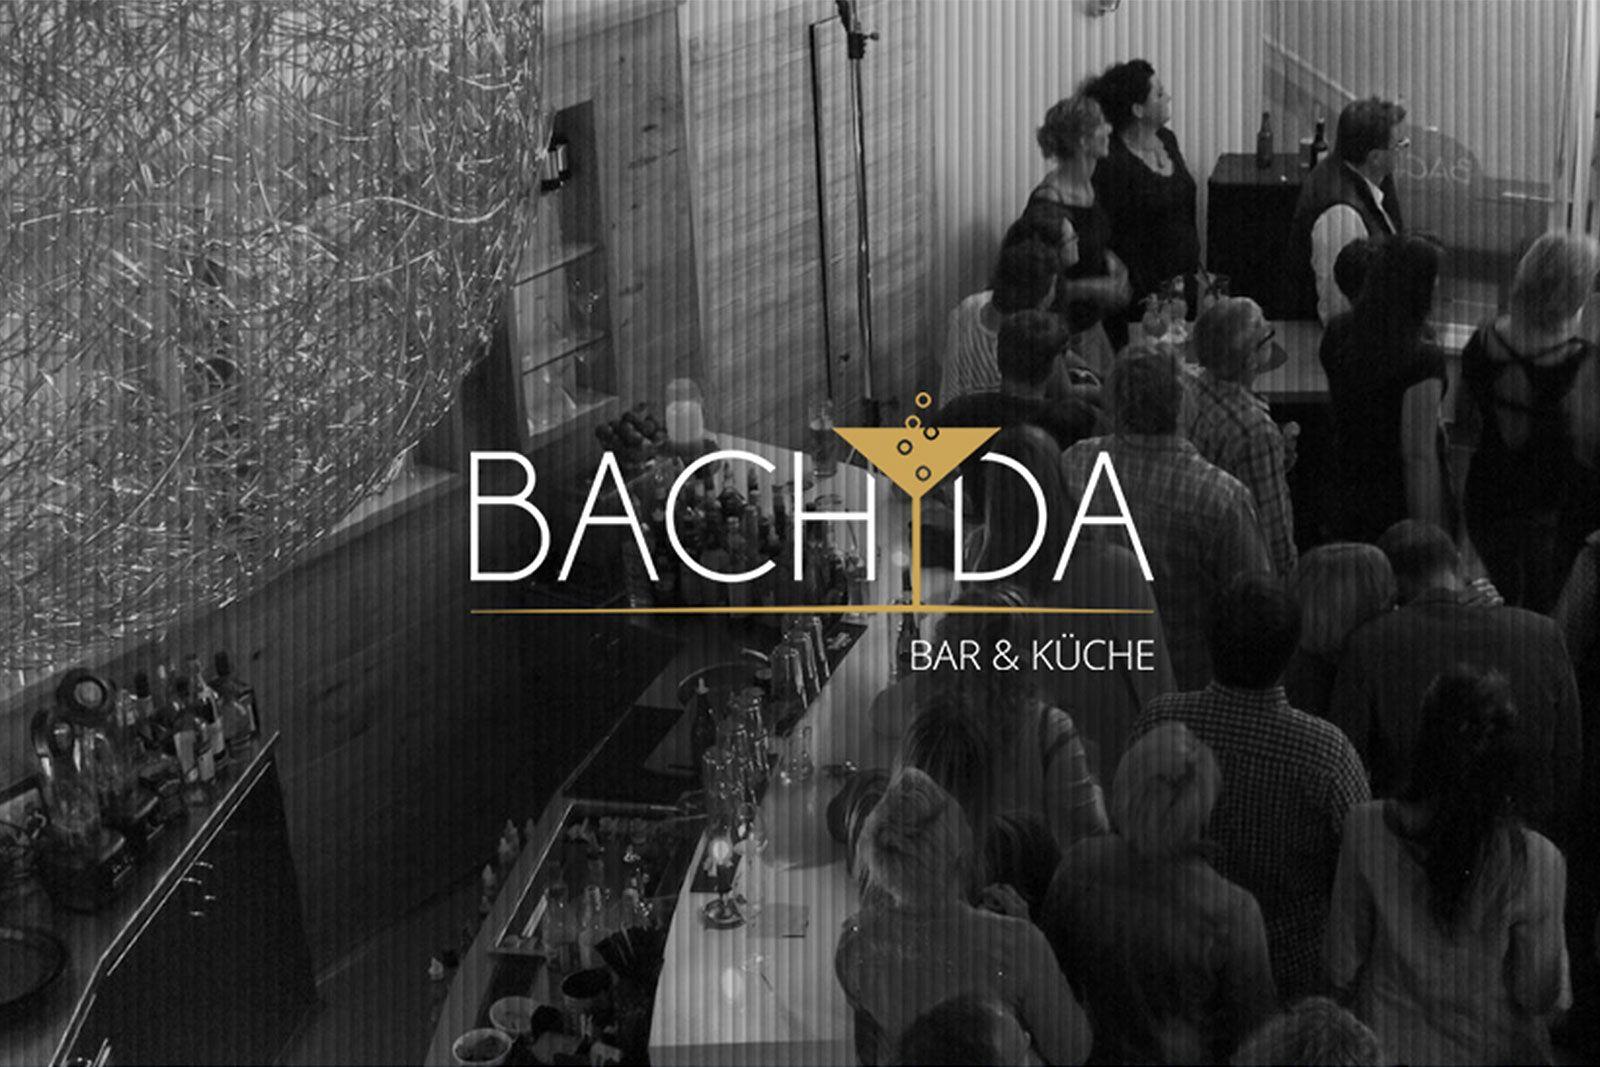 Sehenswürdigkeiten Murnau Bachida